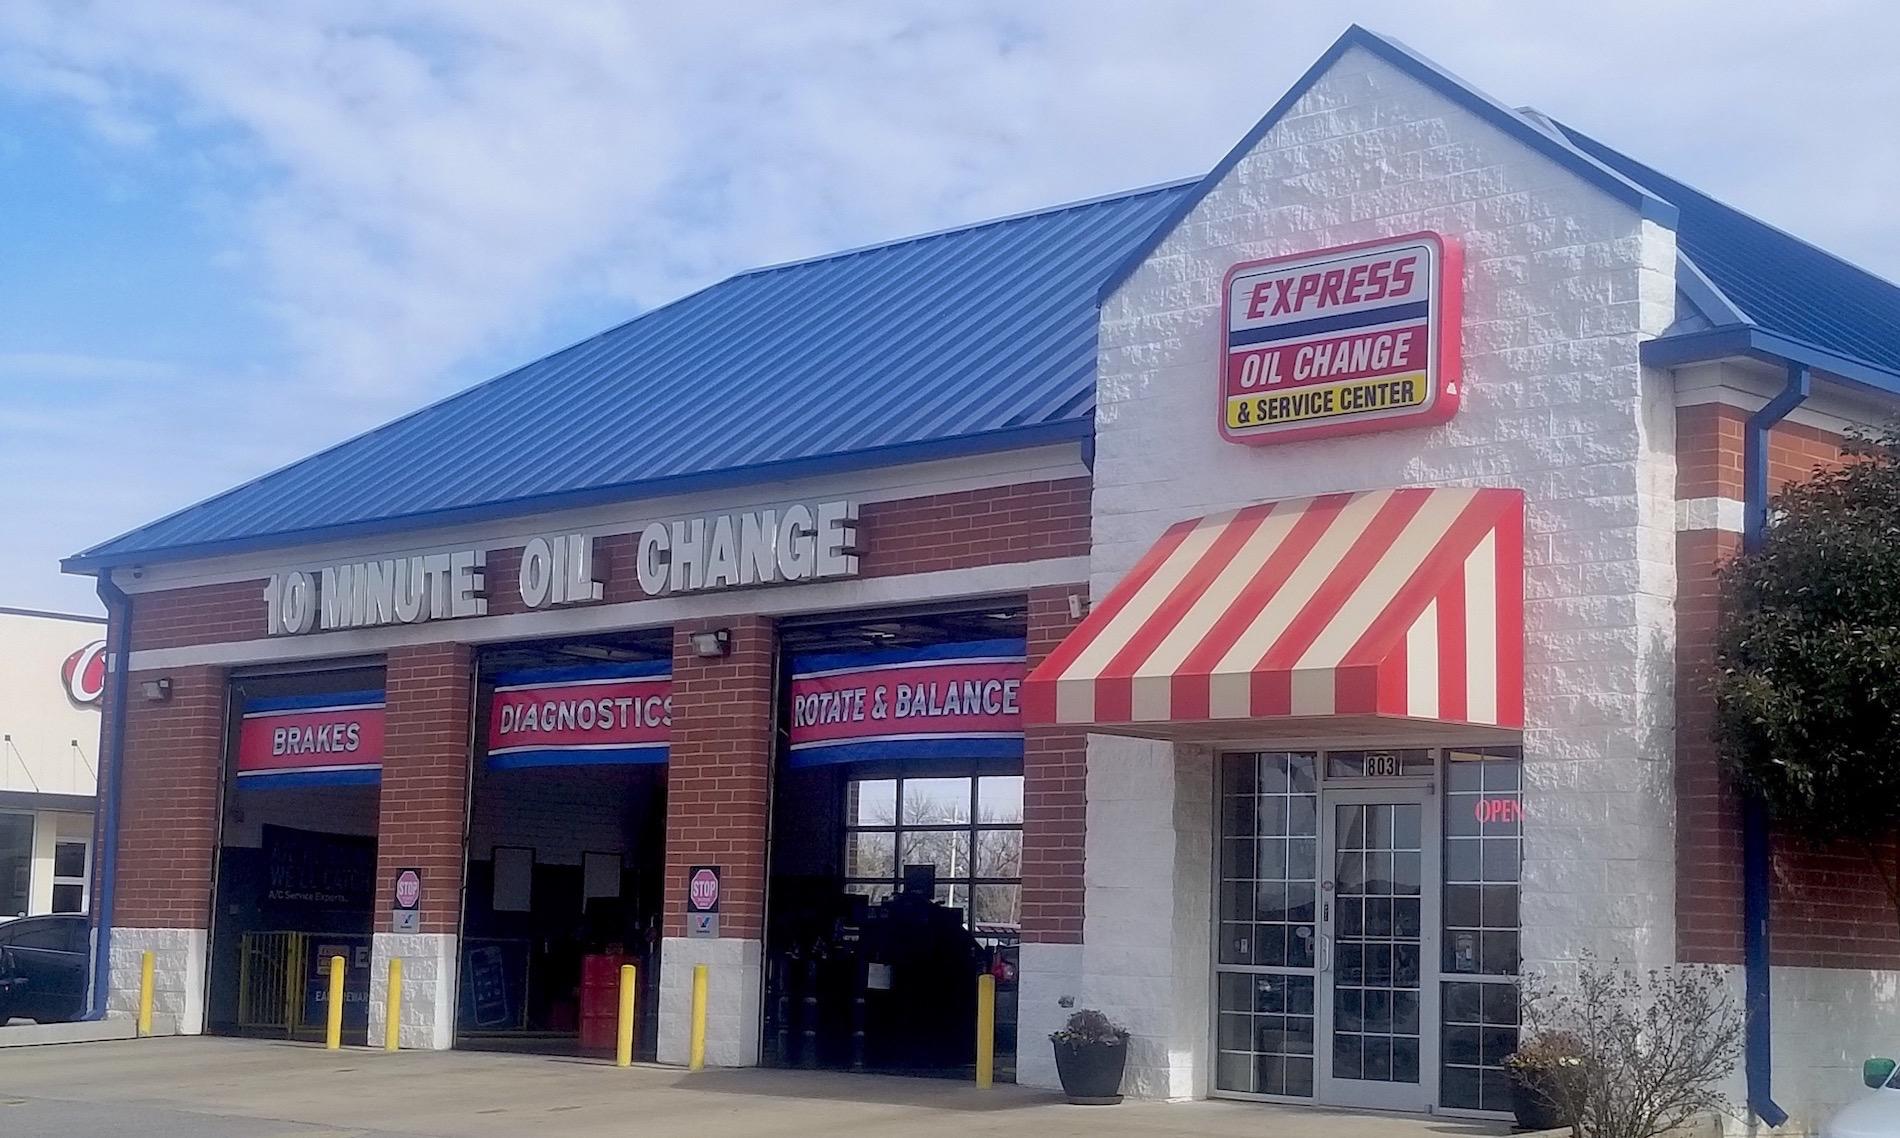 Express Oil Change & Service Center Lawton, OK store